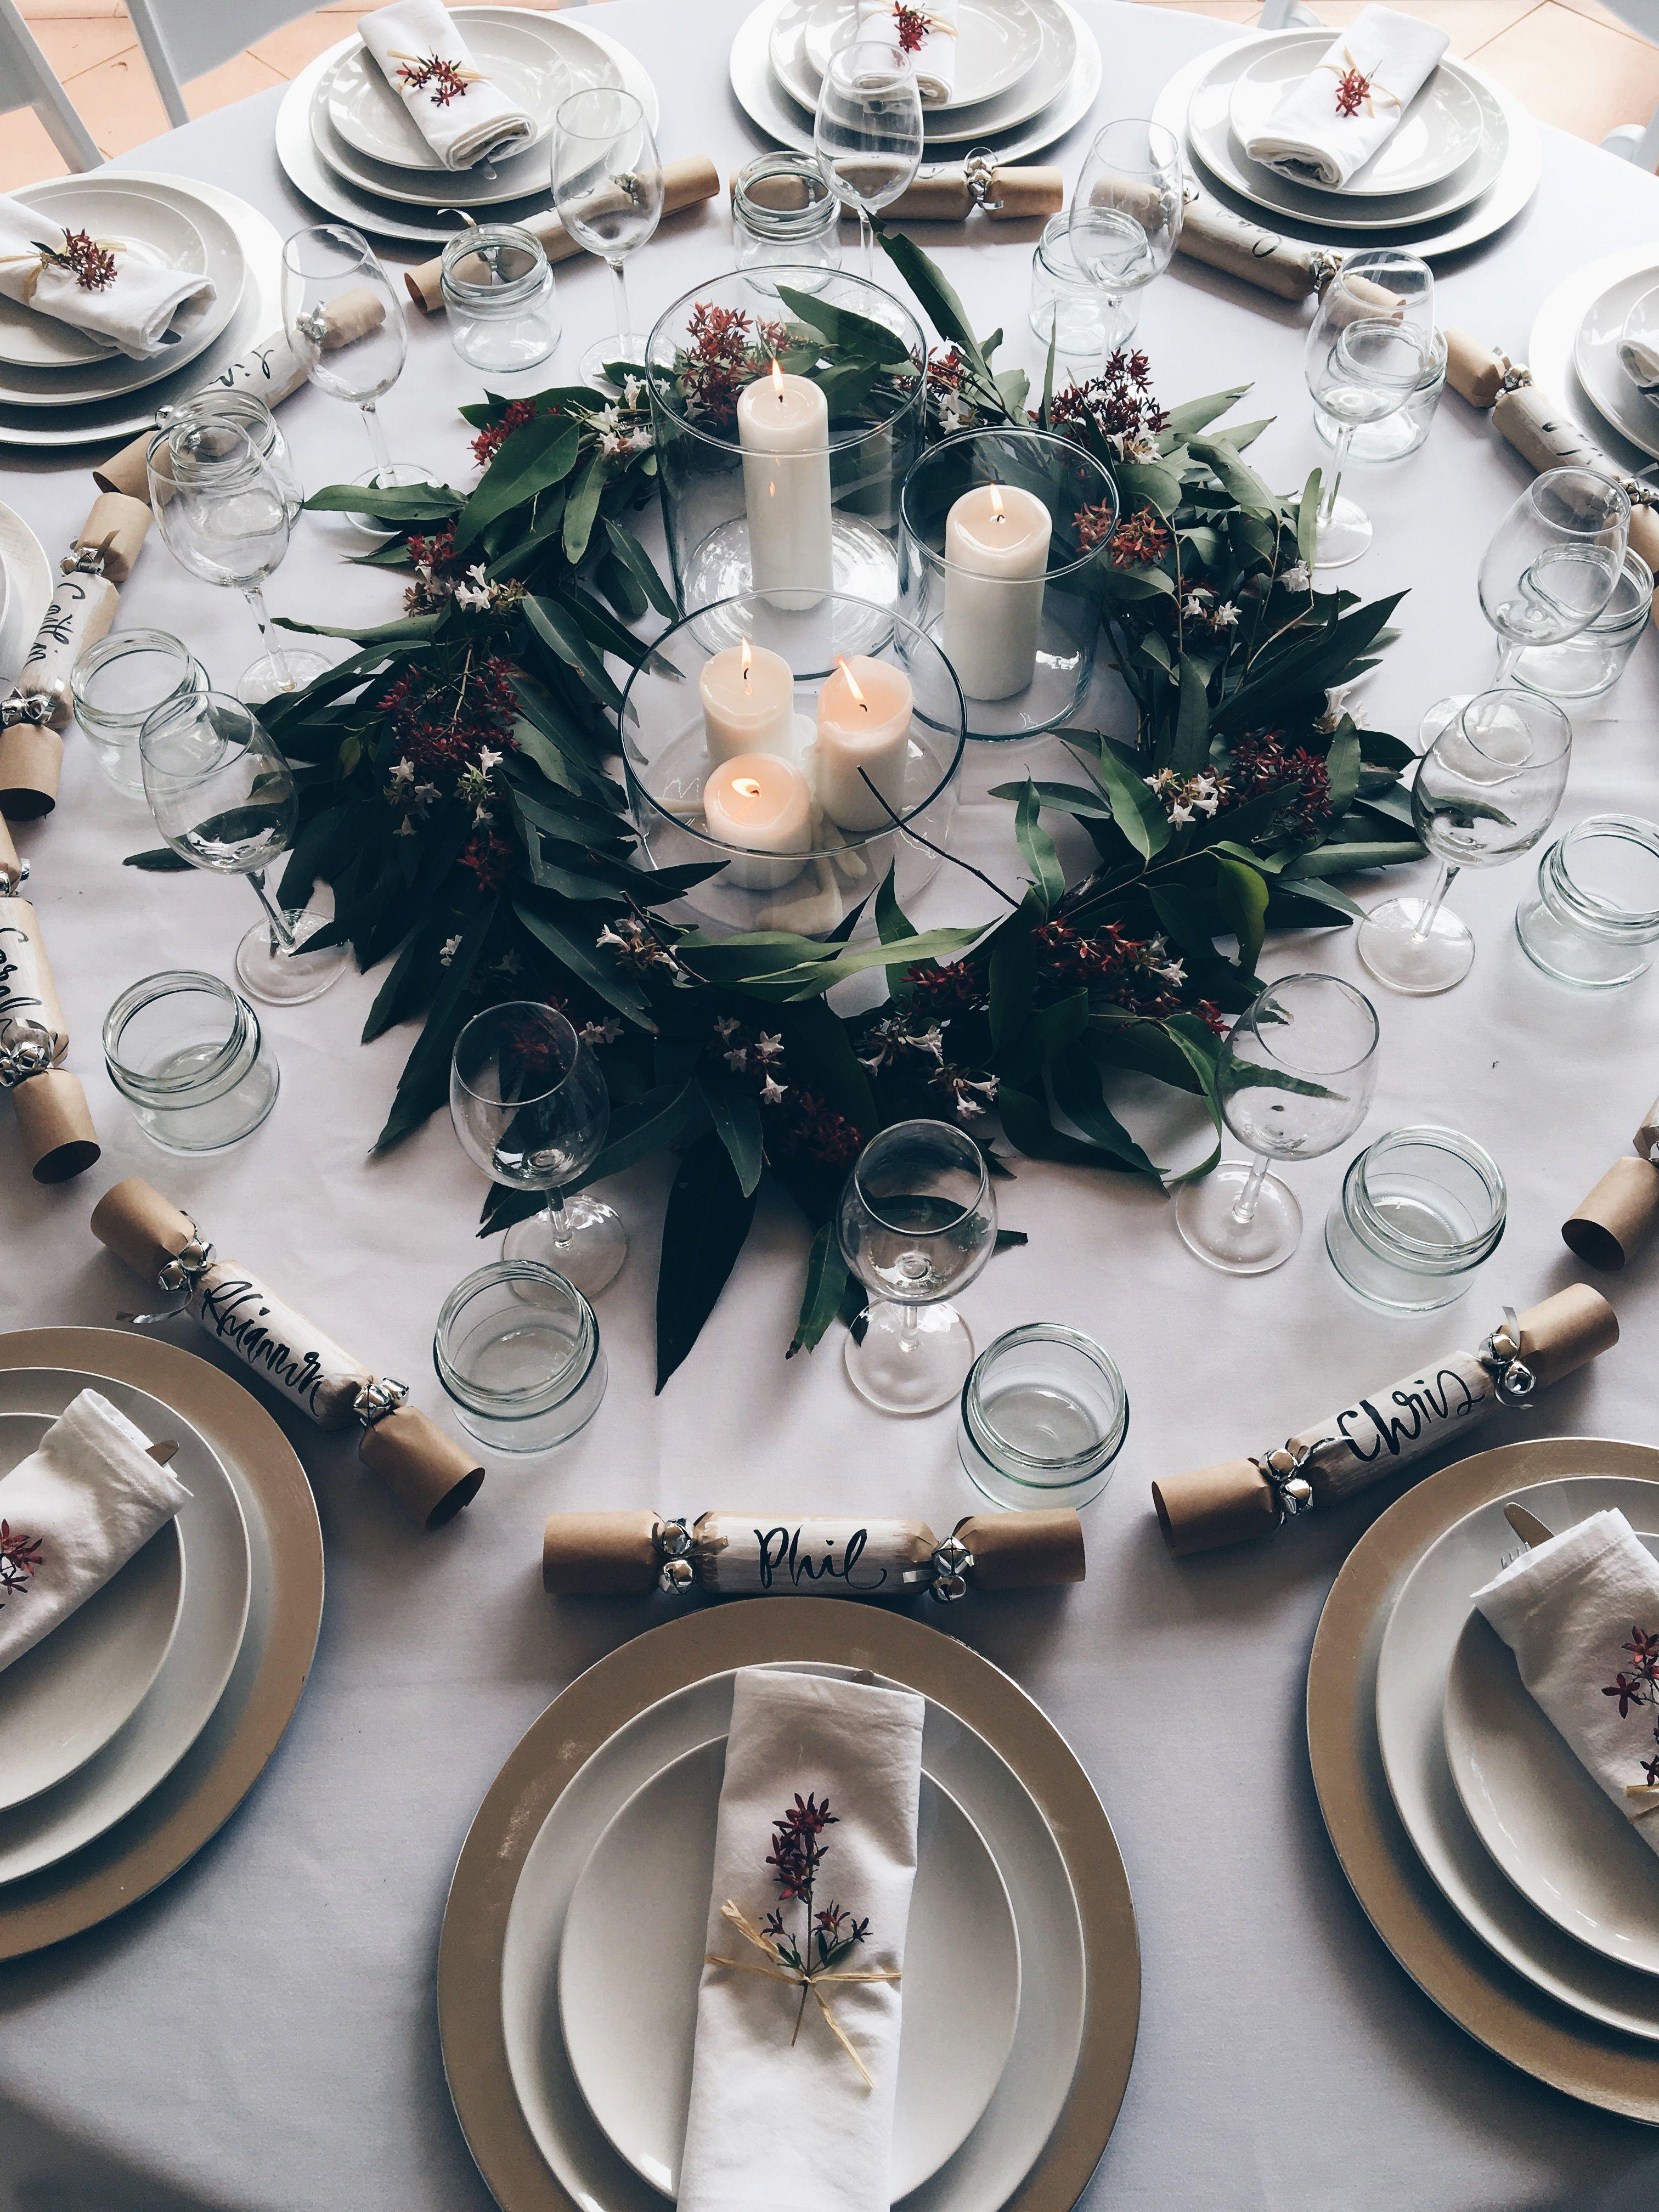 Australian Christmas Table Arrangement Native Wreath Garland Made Using Eucalyptus Leaves Australian Christmas Christmas Settings Corporate Christmas Parties